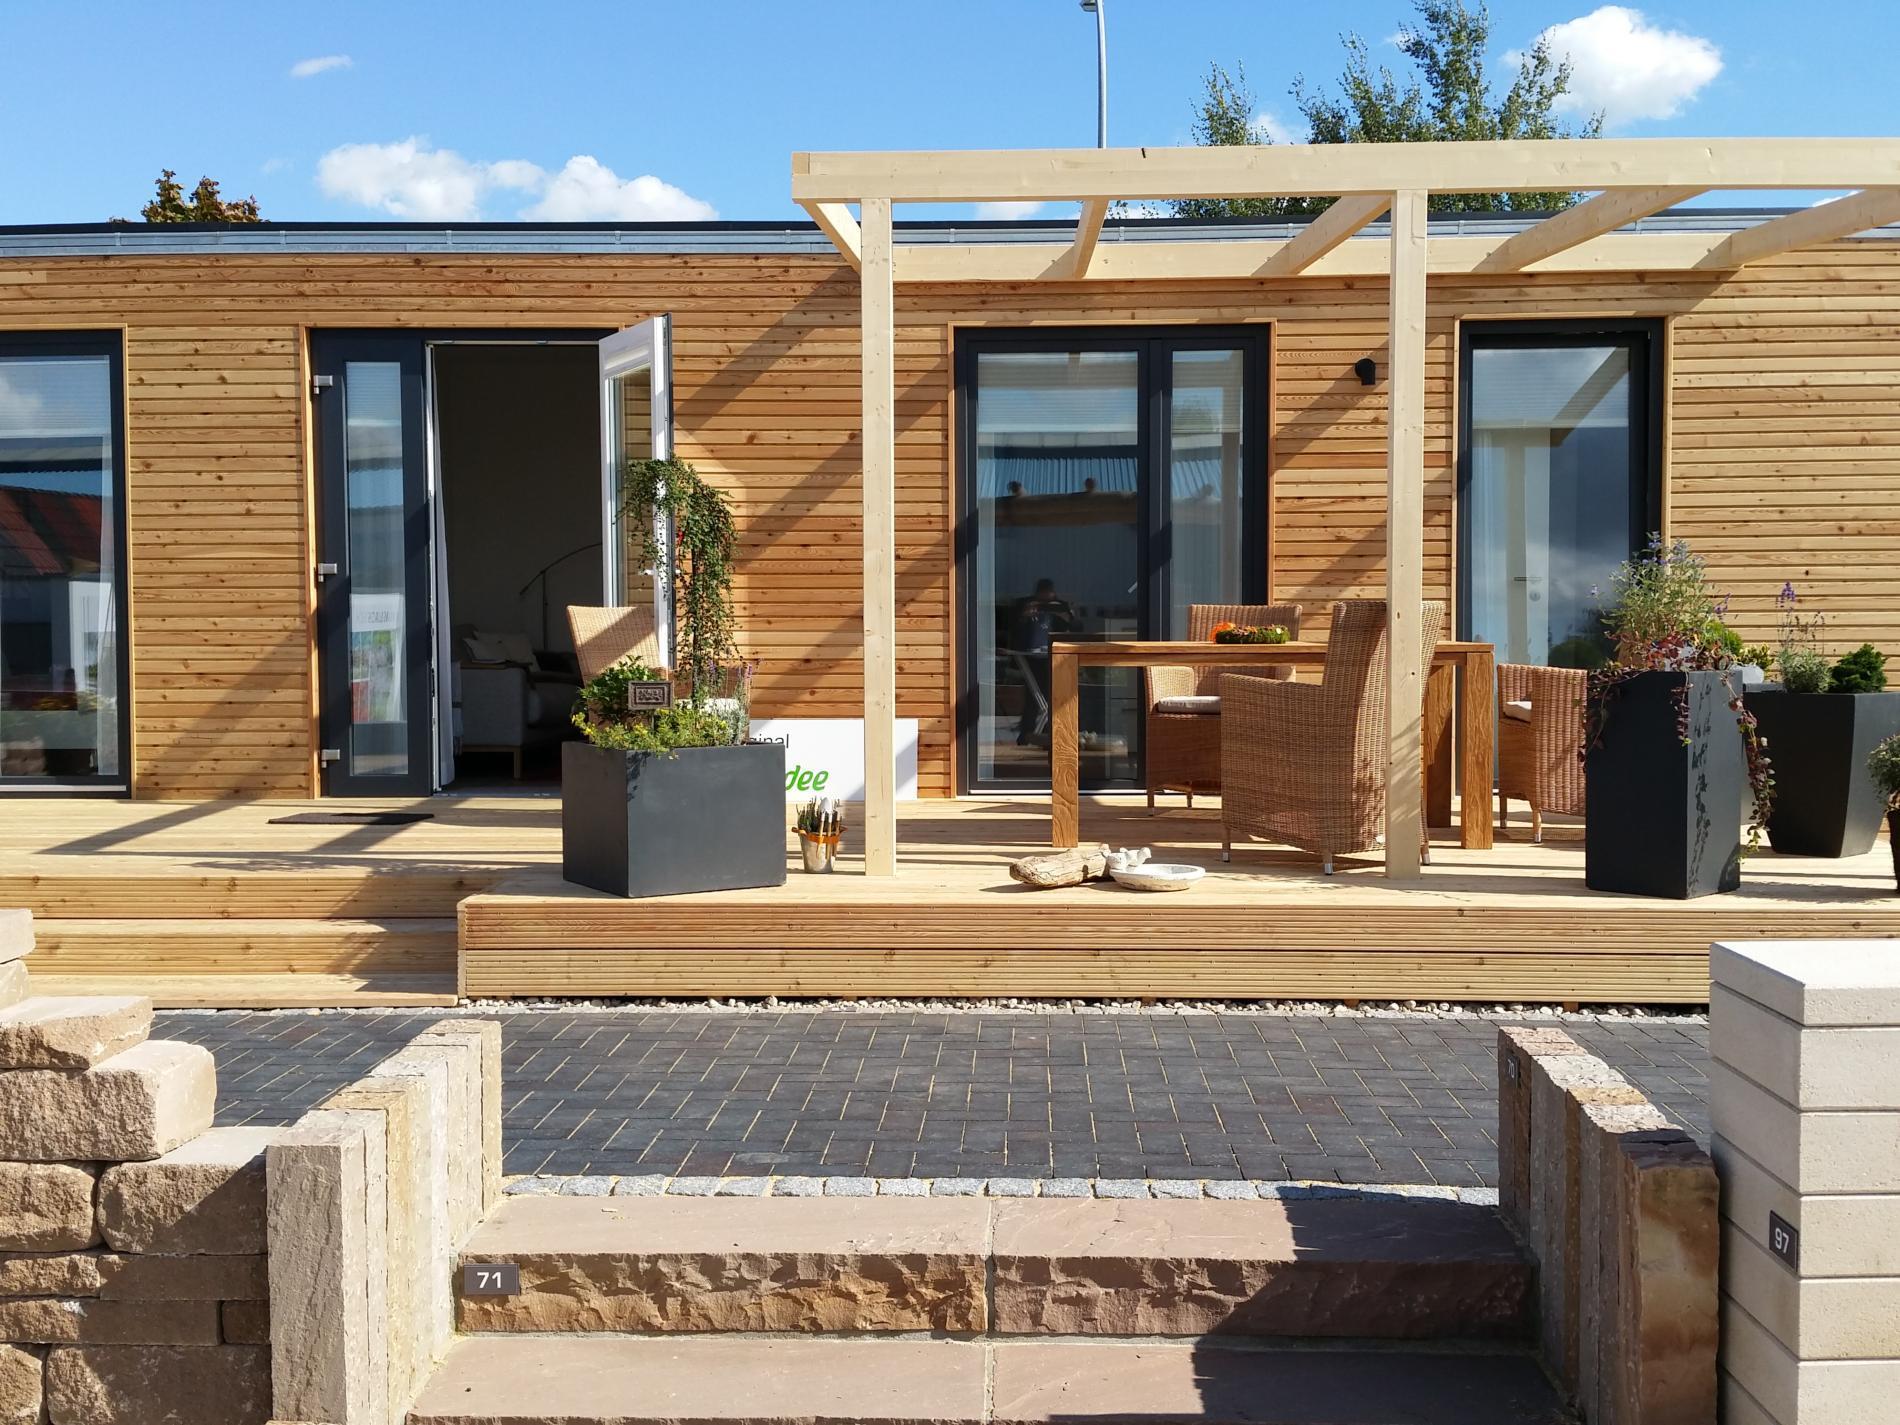 modulhaus hersteller reba immobilien ag bietet mobile modulh user aktuelles reba immobilien. Black Bedroom Furniture Sets. Home Design Ideas